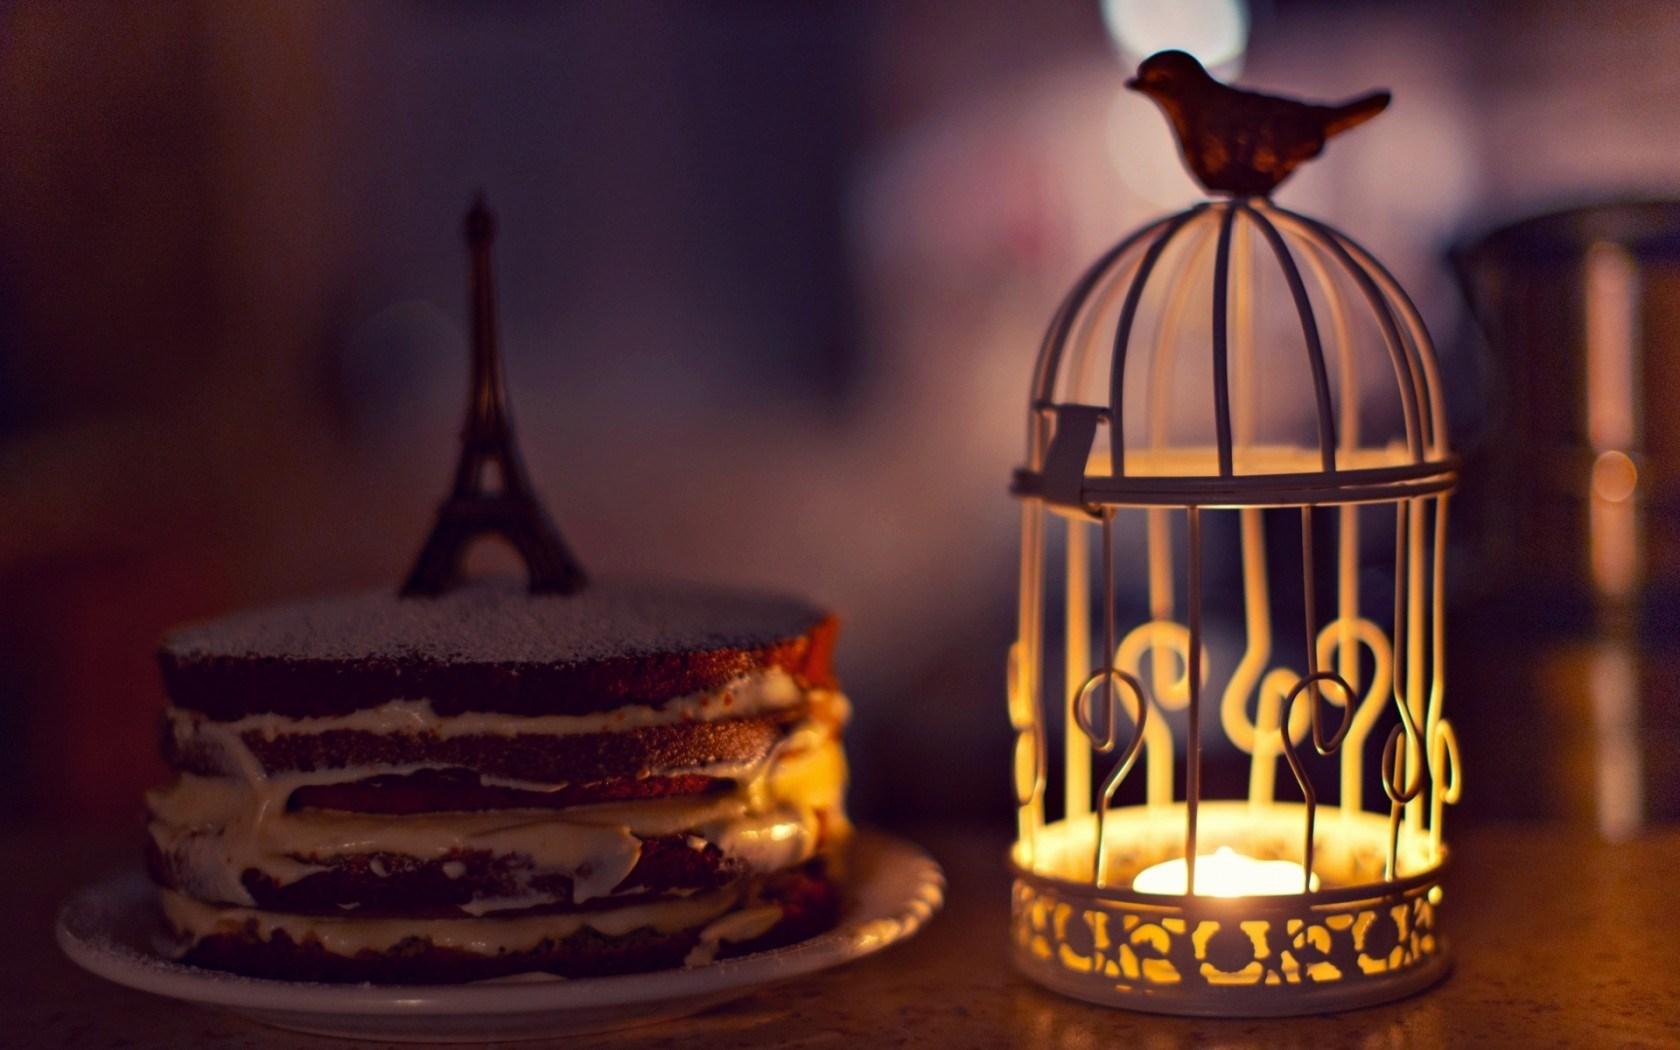 Cute Rat Wallpaper Hd 1366x768 Mood Cell Candle Lantern Bird Cake Eiffel Tower Statue